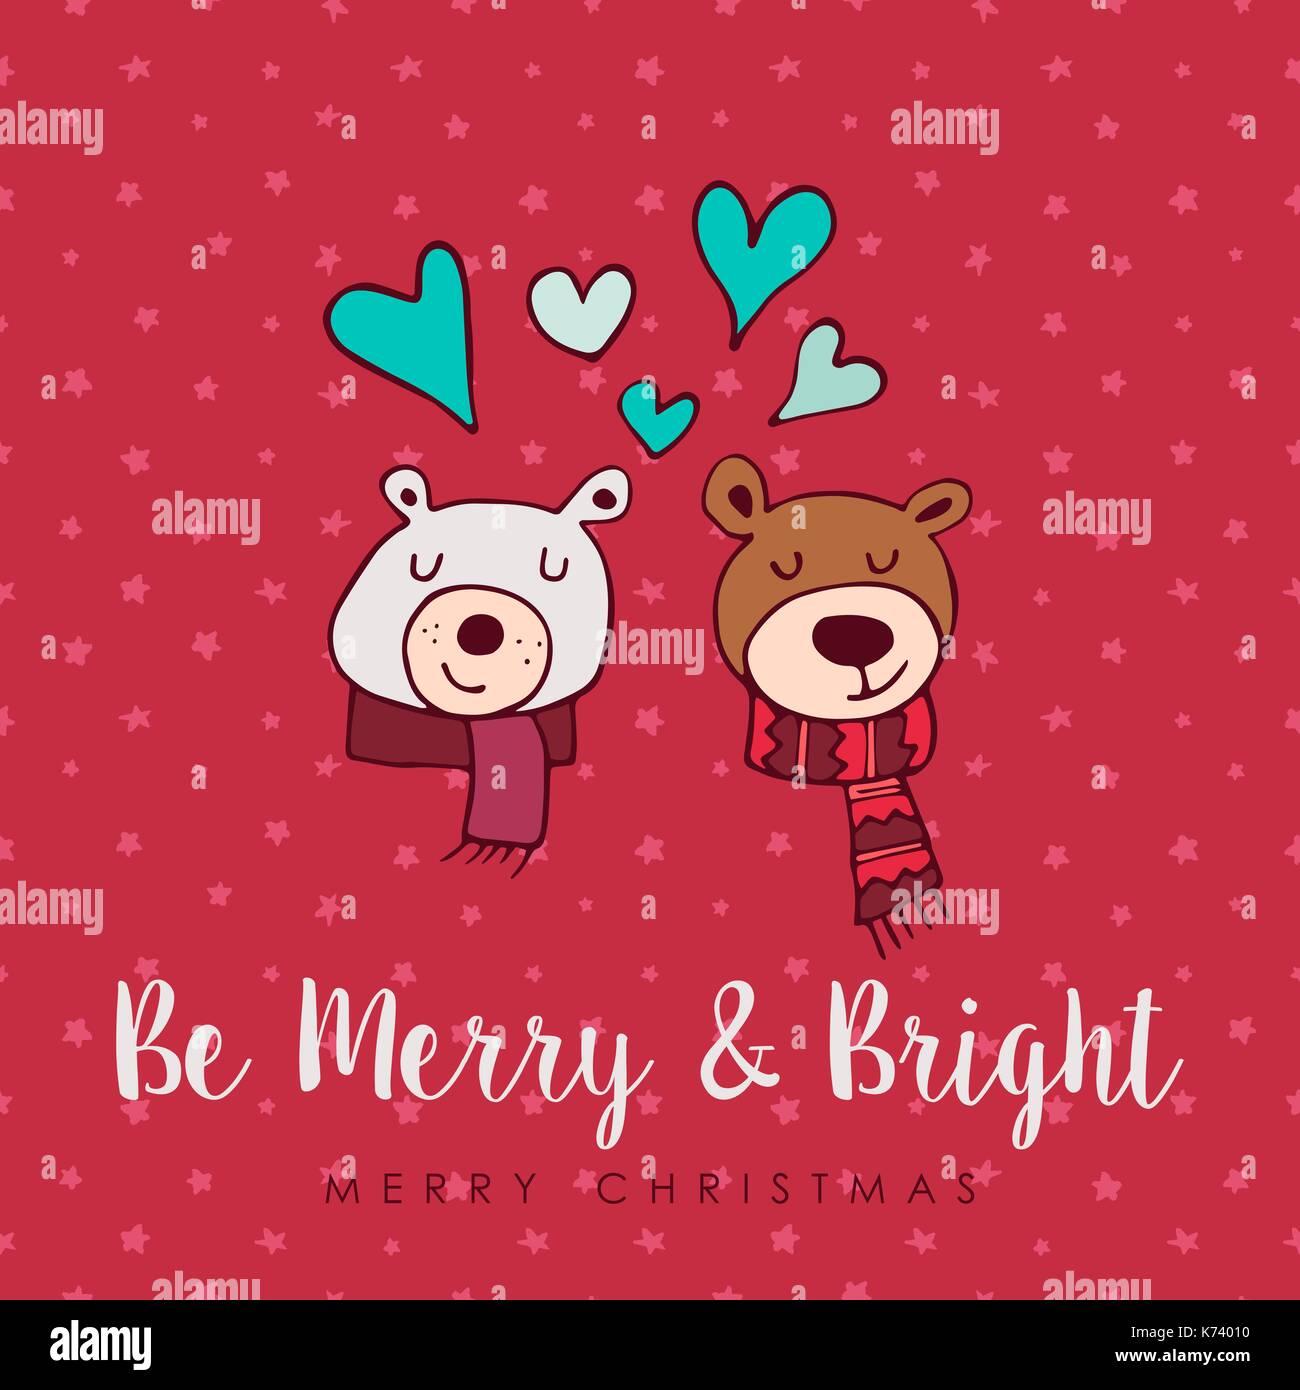 Merry Christmas Hand Drawn Bear Greeting Card Illustration Cute